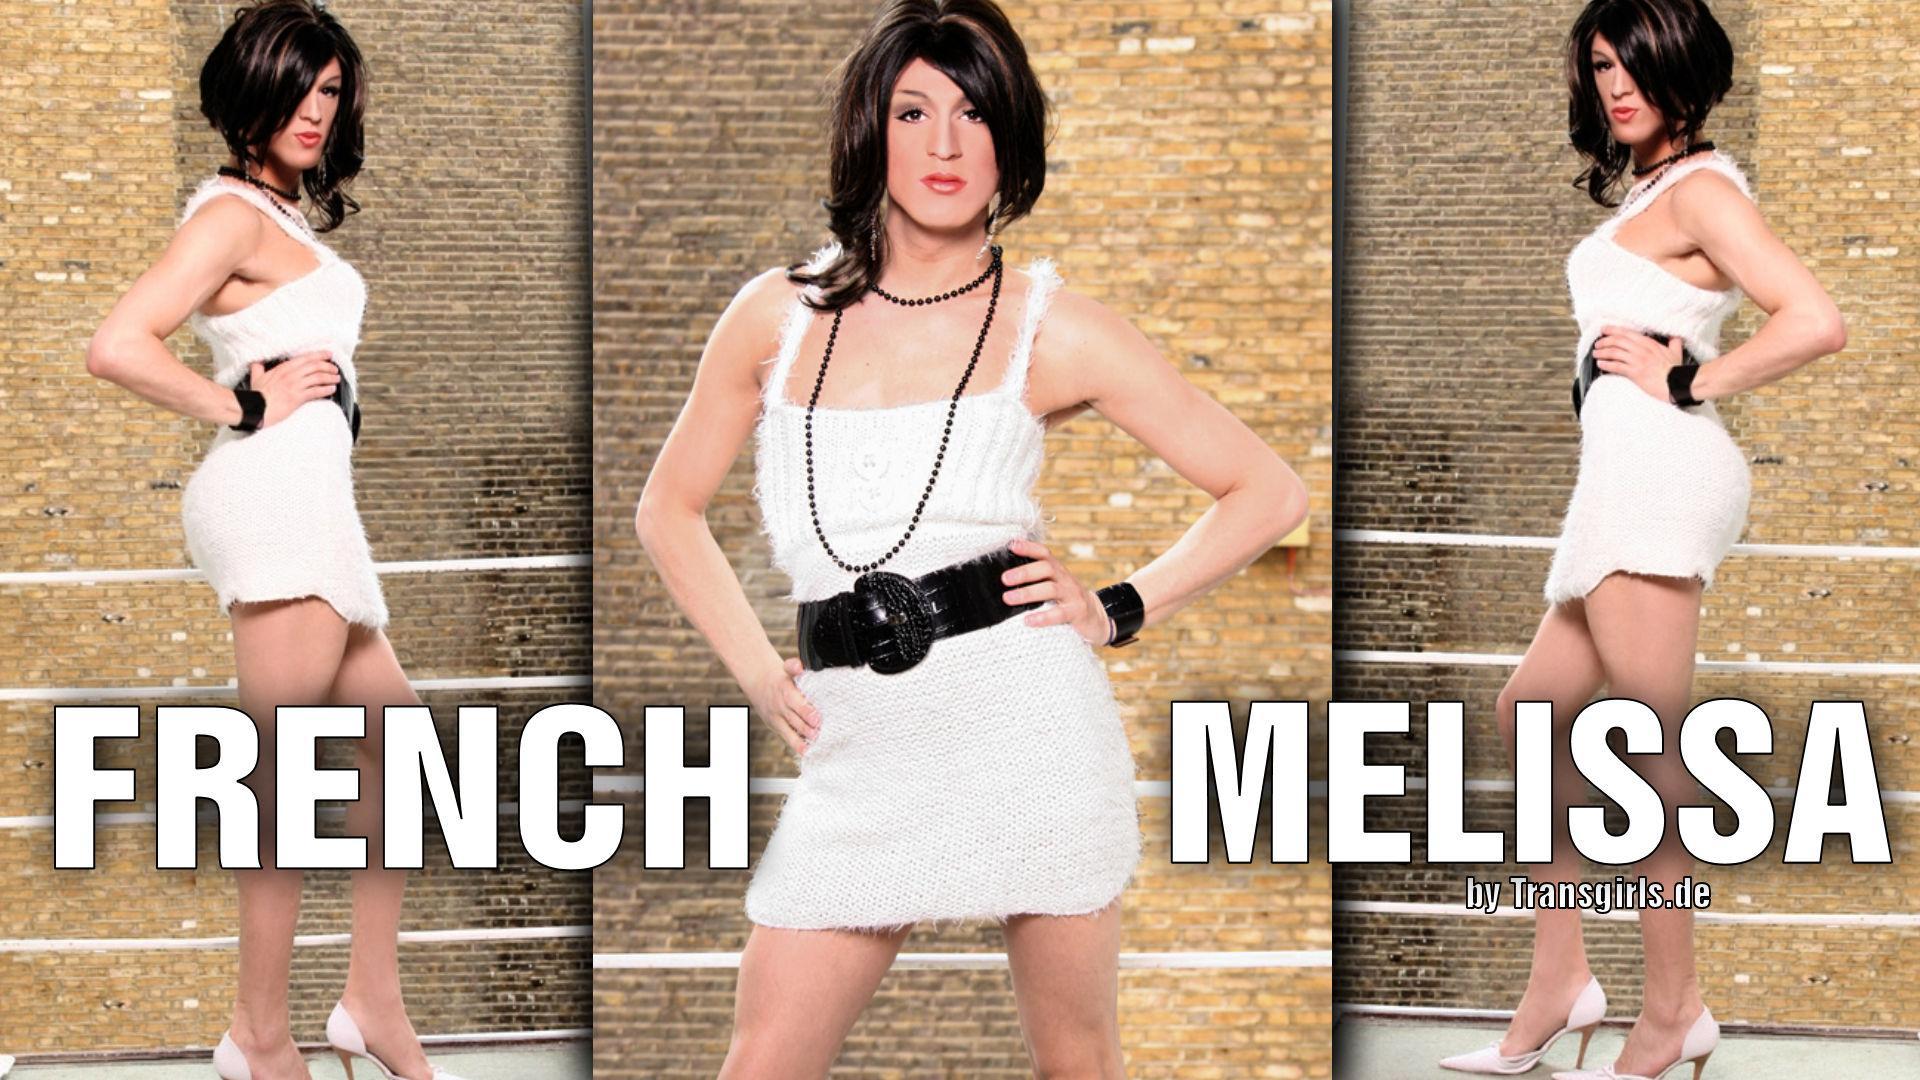 French Melissa Shemale in Frankfurt am Main